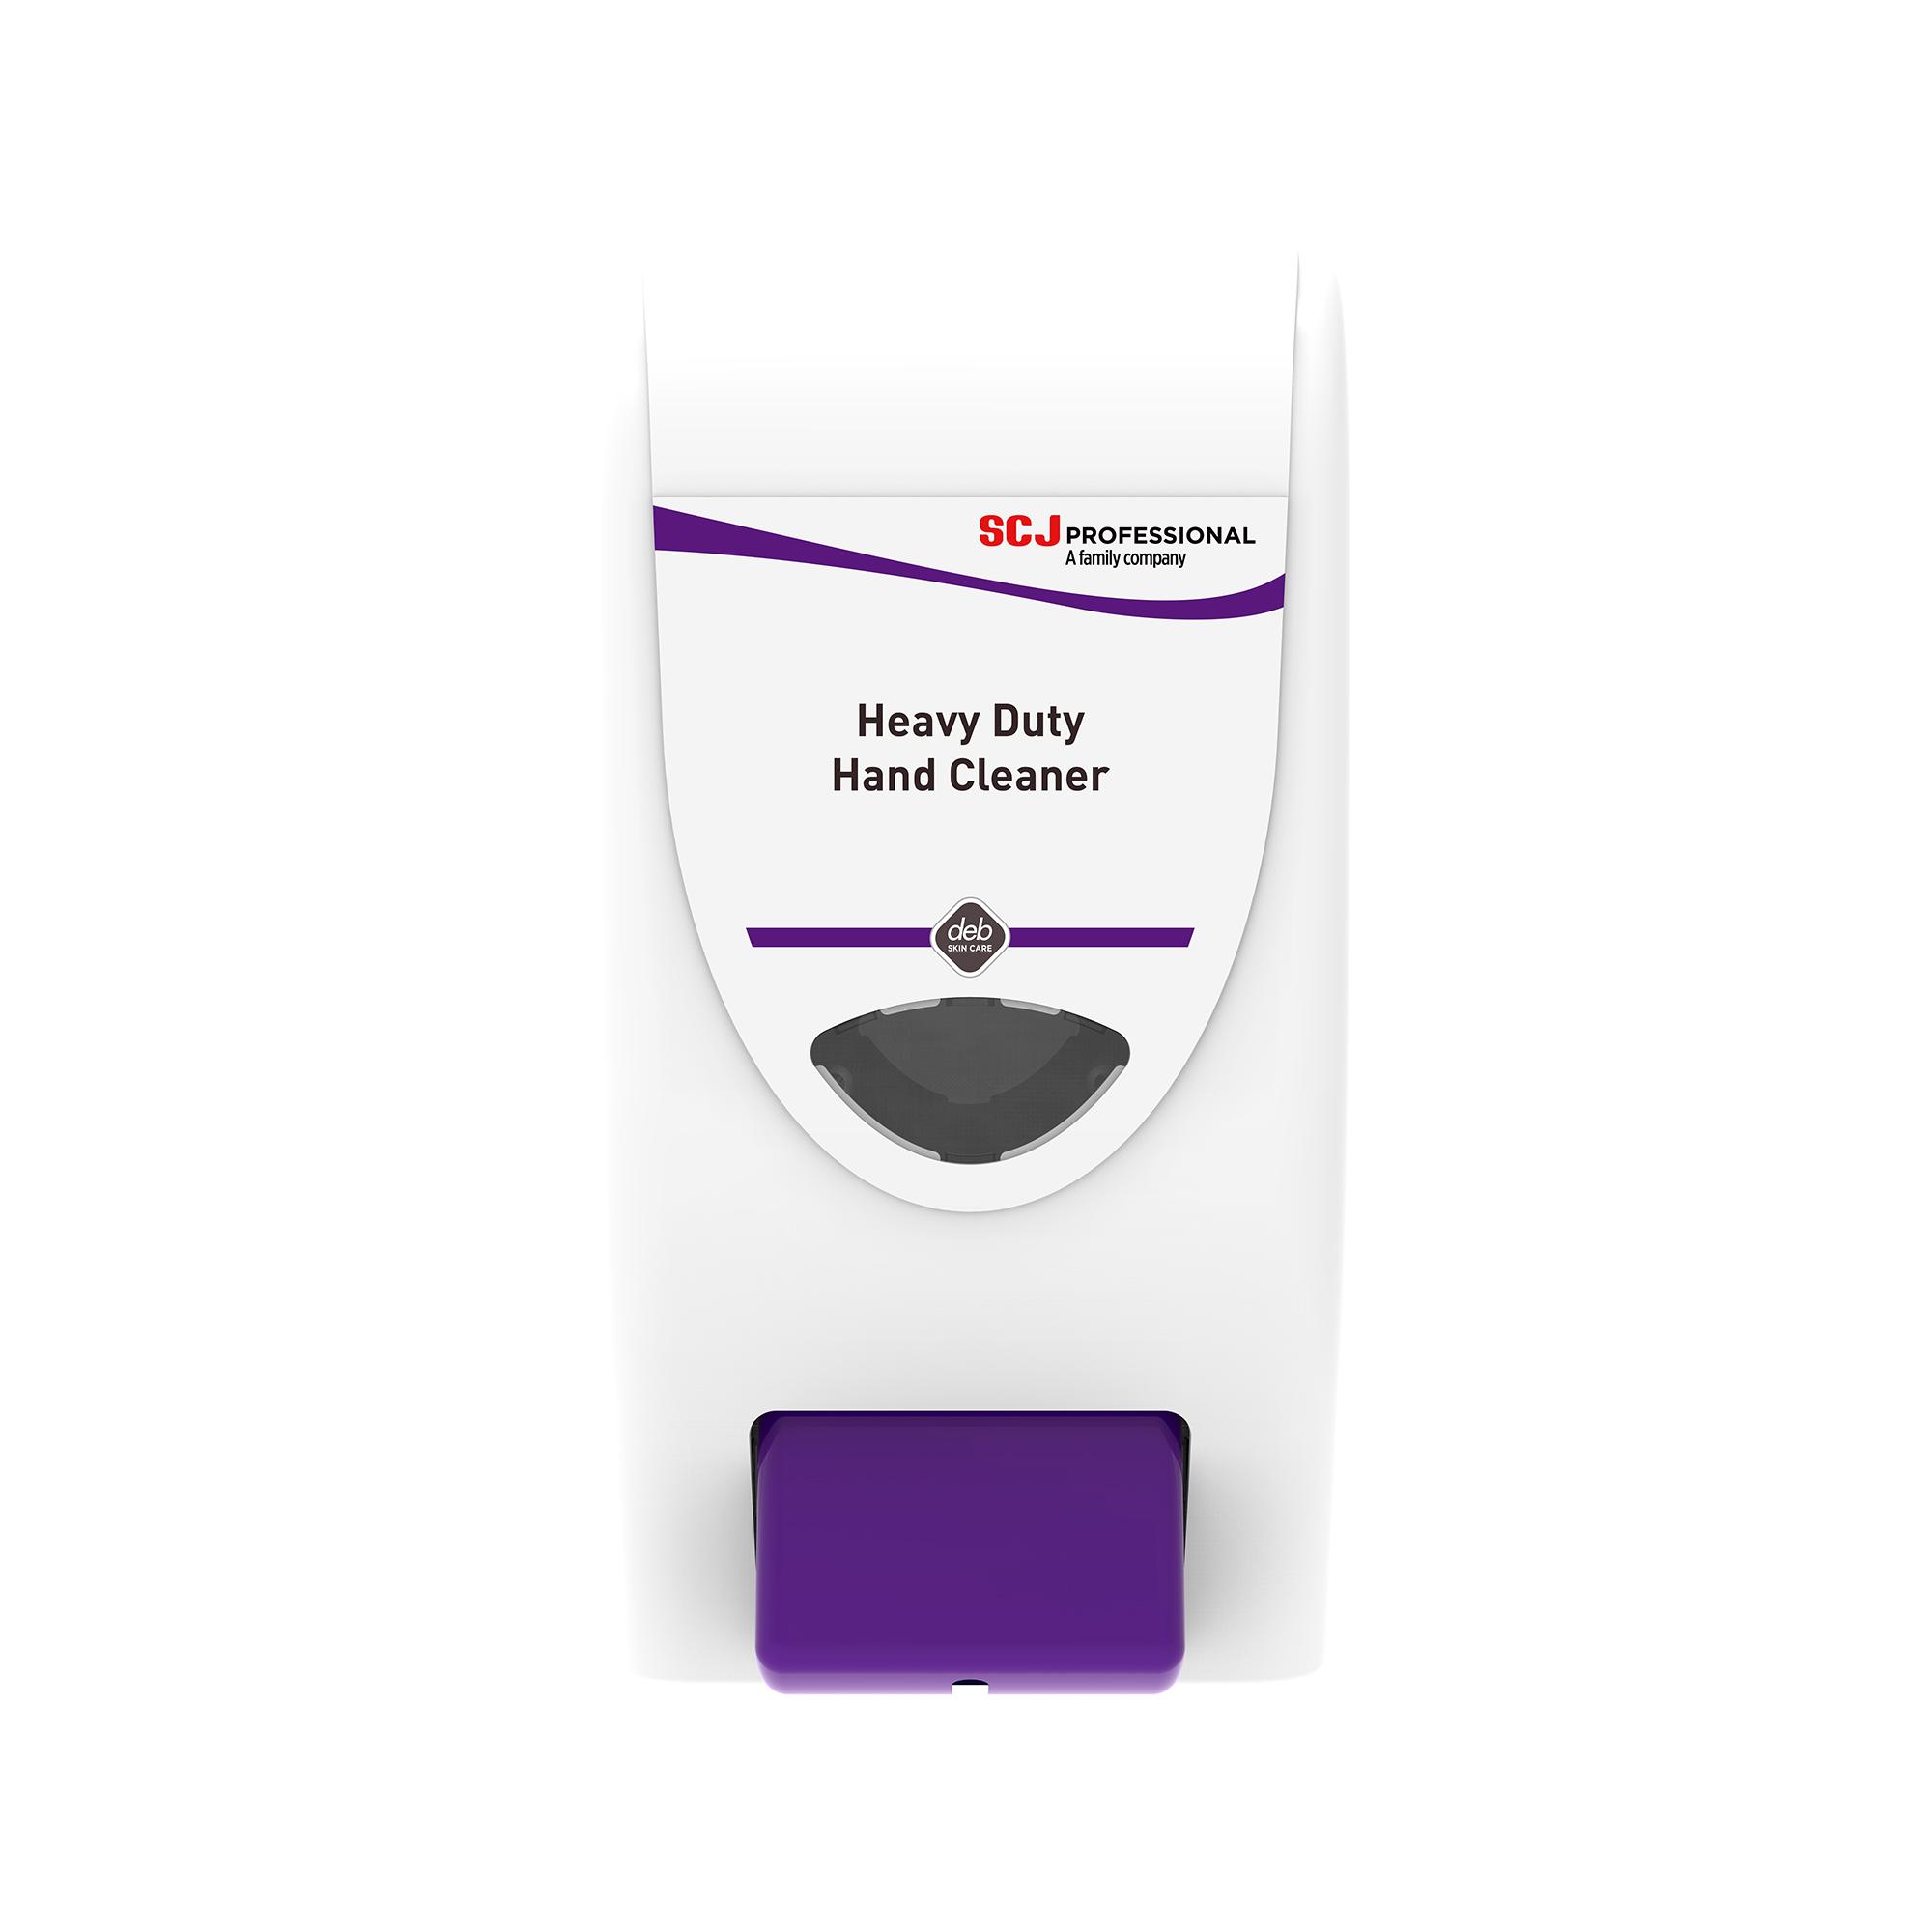 DEB Limewash Hand Soap Refill Cartridge 4 Litre Ref N03862&FOC Disp [Free Dispenser]